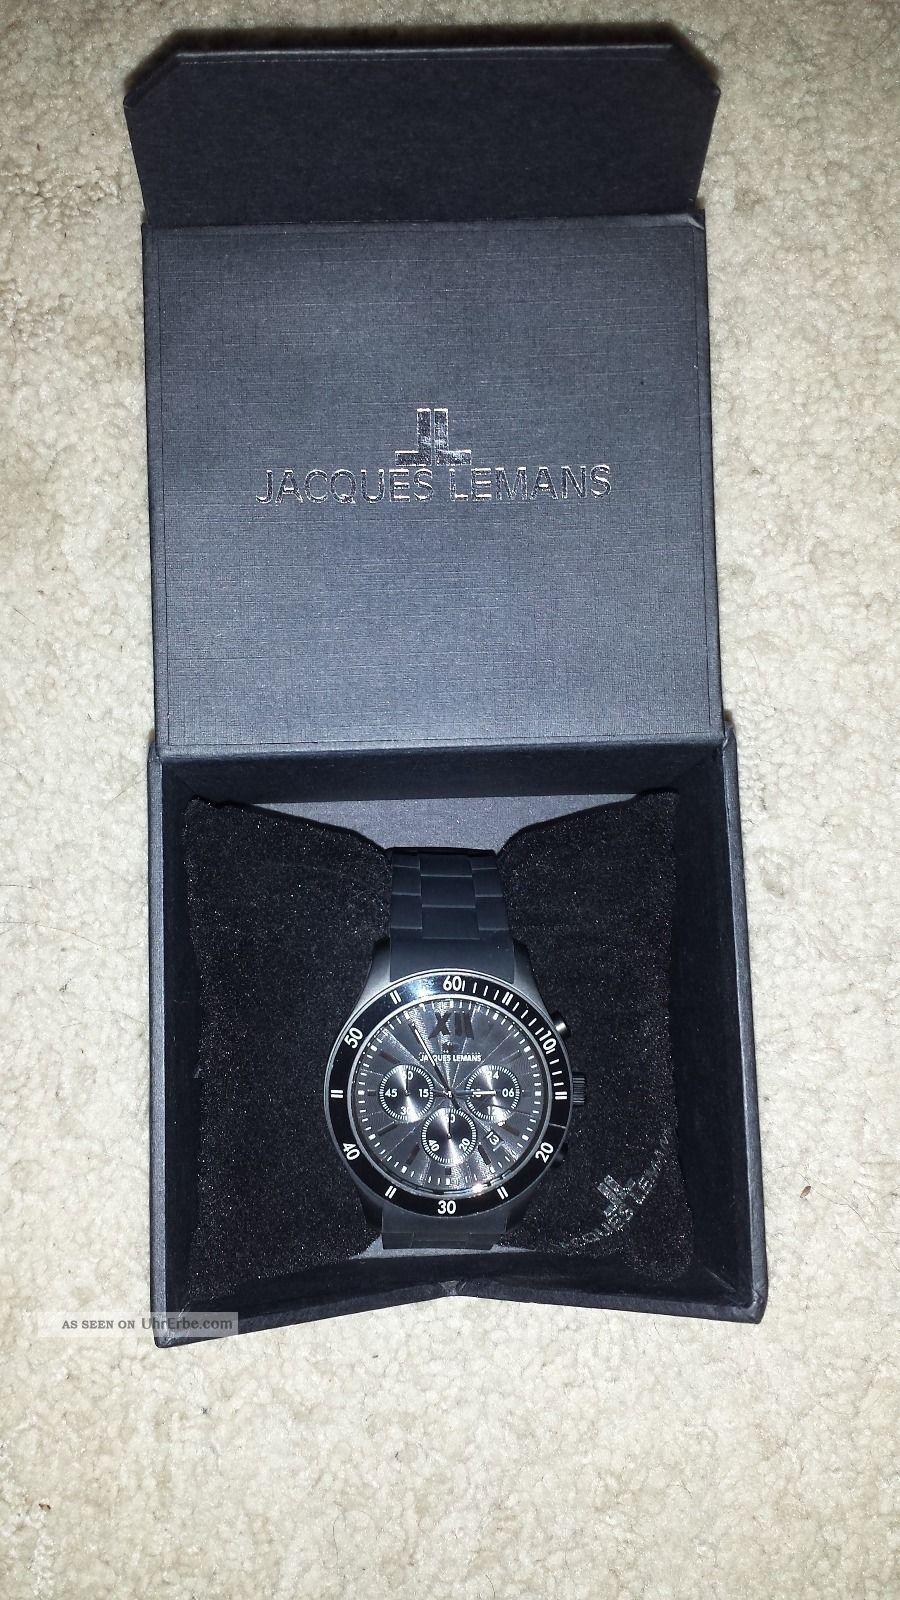 Jacques Lemans 1 - 1586 Armbanduhr Für Herren Armbanduhren Bild